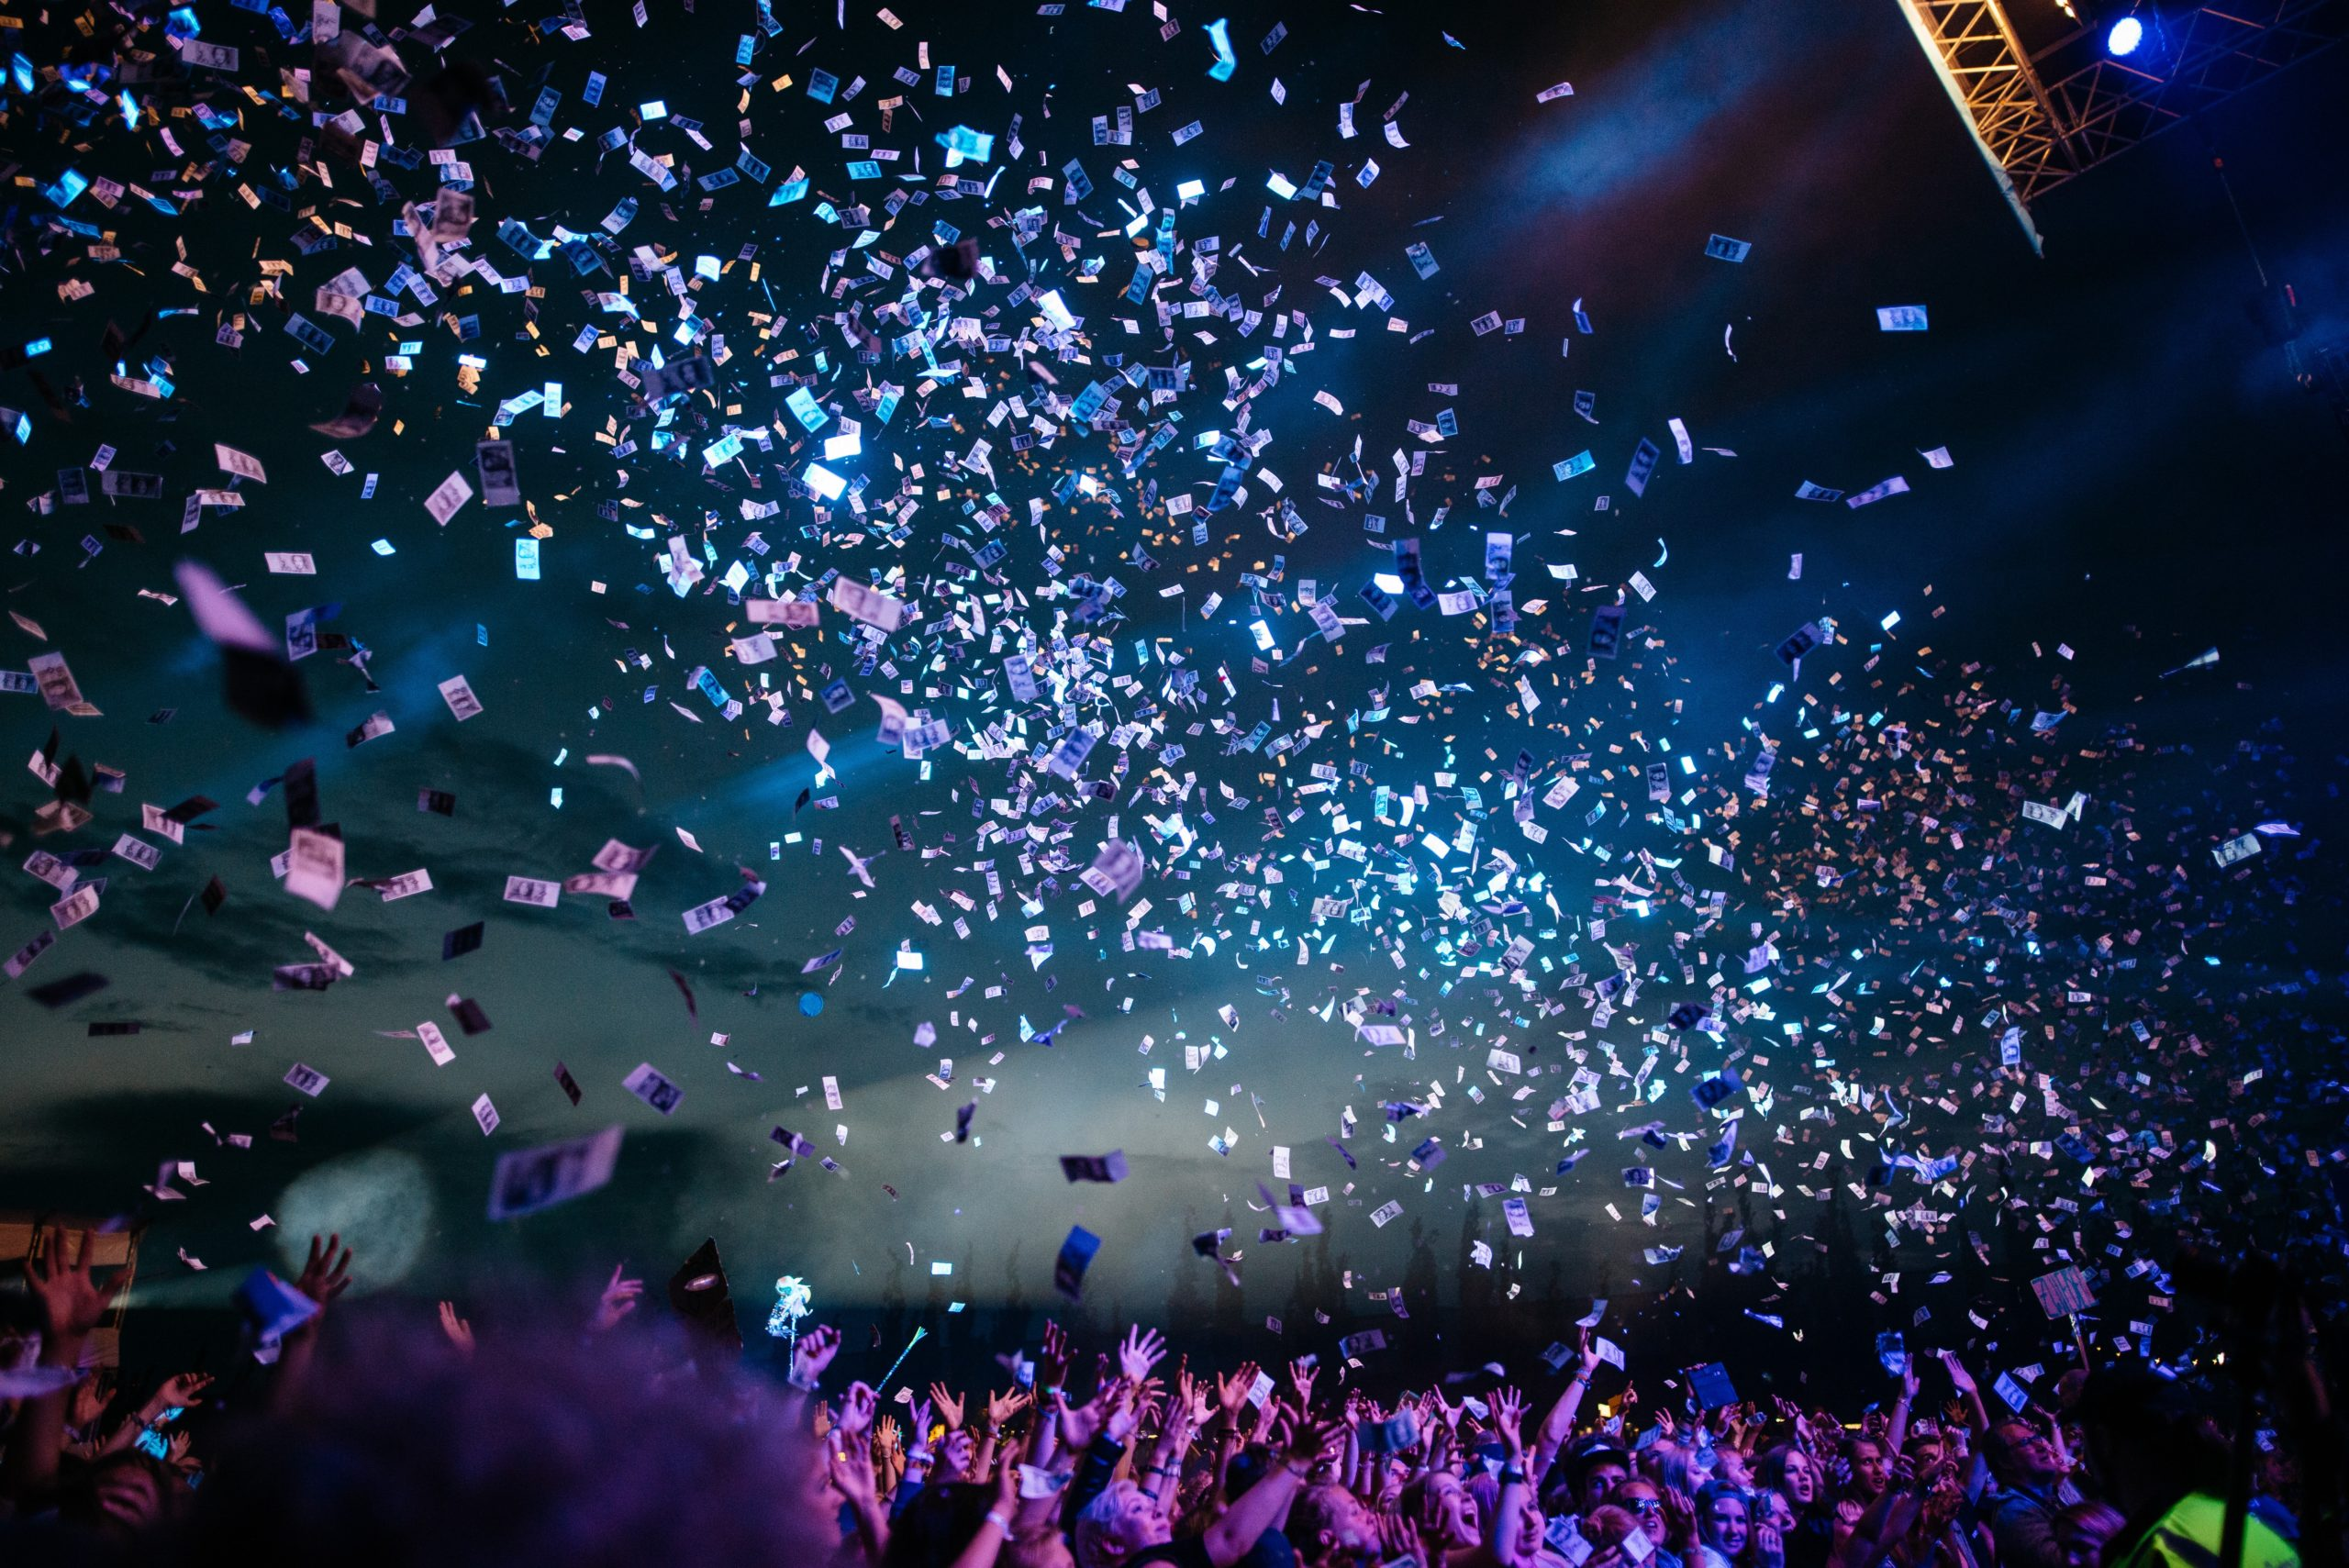 umake無観客ライブ「3rd Live〜TRIPPERS!!〜大阪」3/15セトリや感想まとめ アーカイブはある?